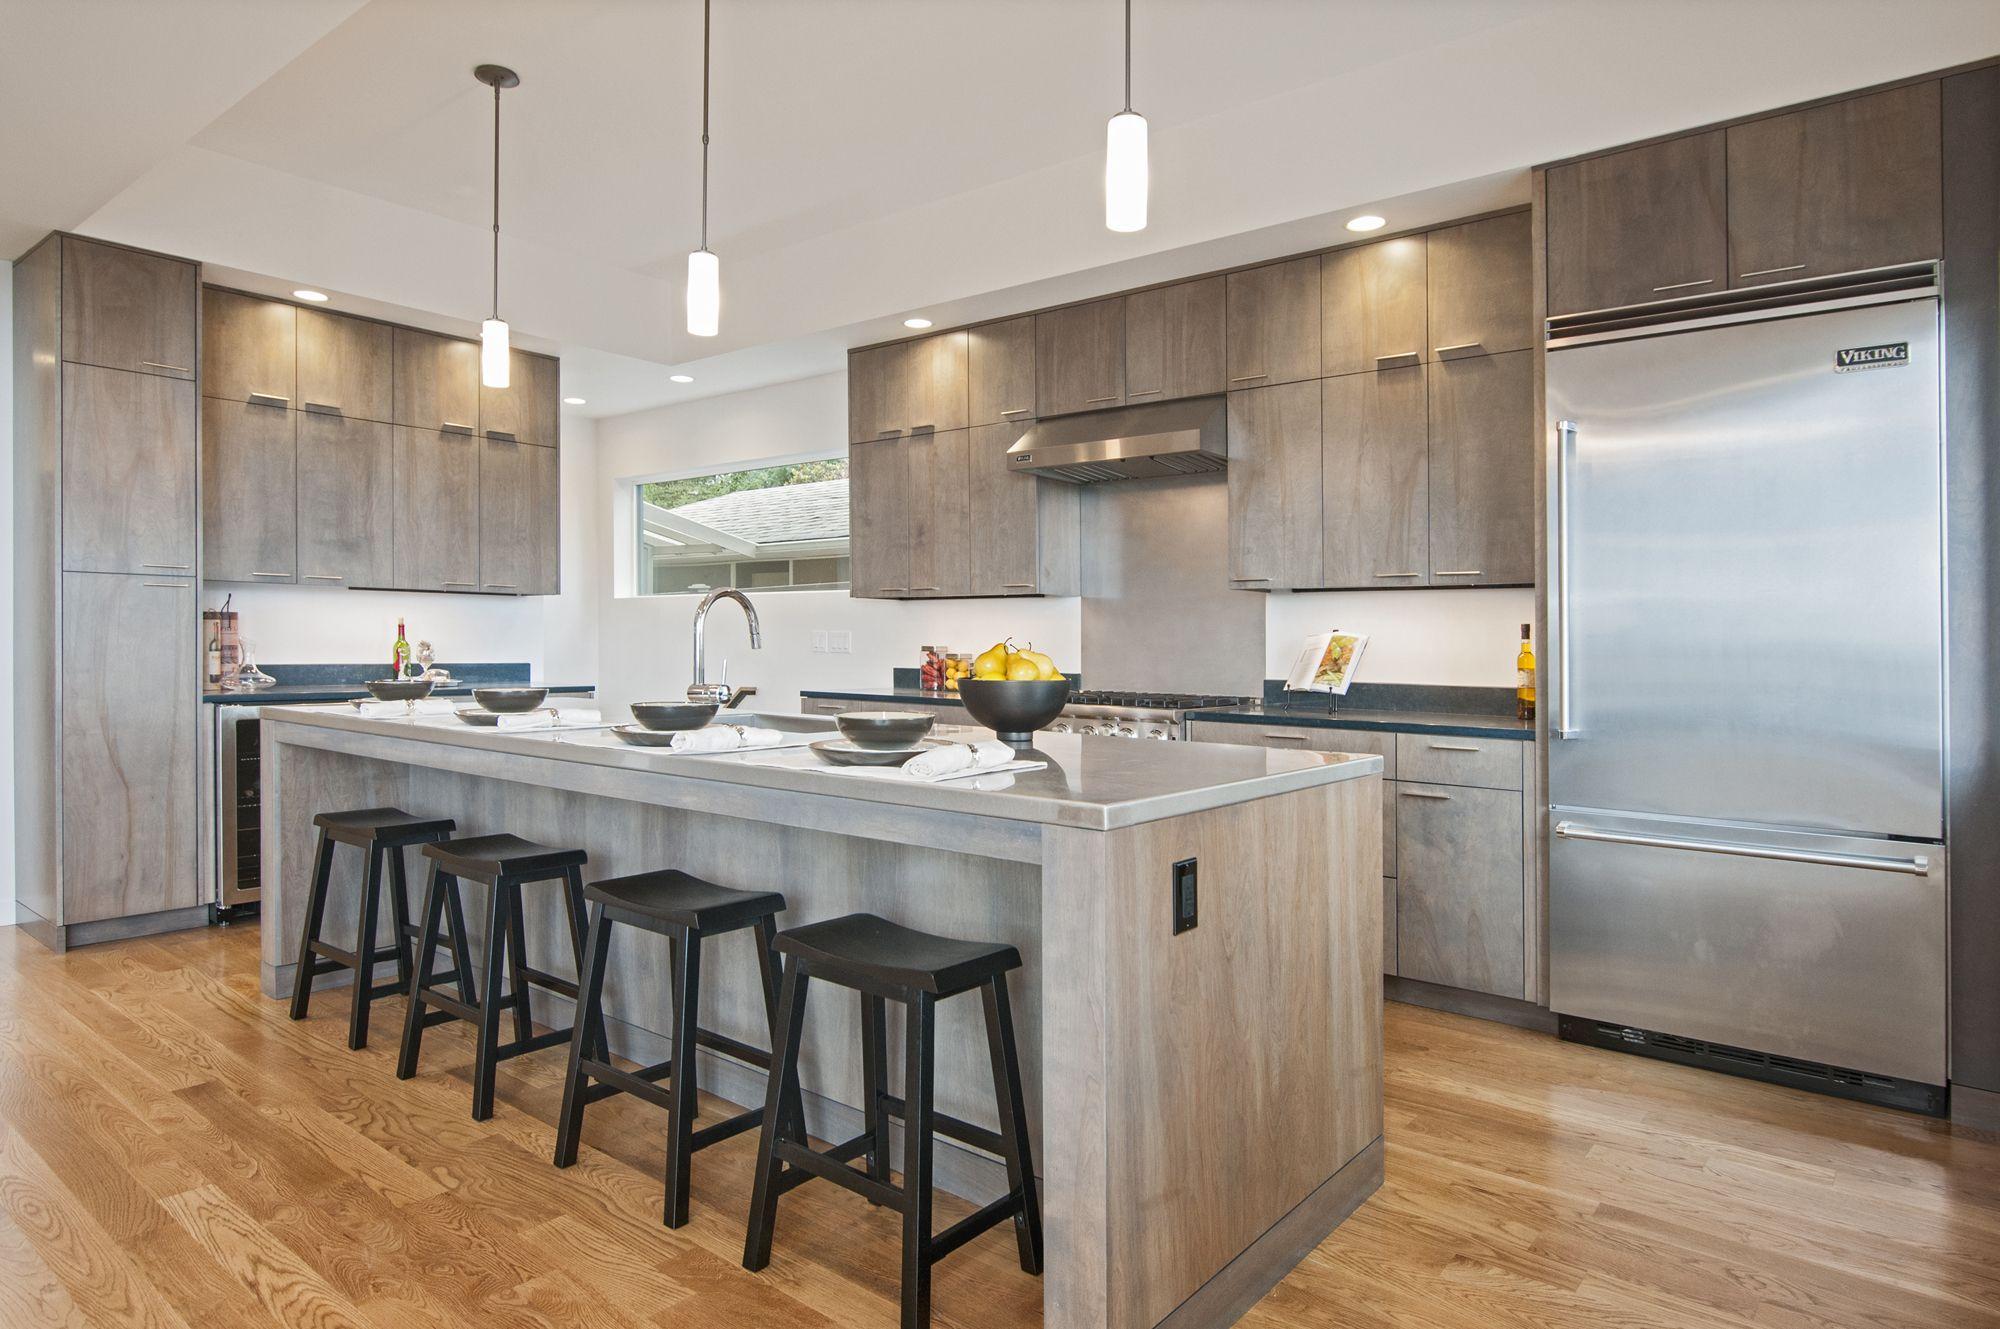 Kitchen Island Full Overlay Birch stained custom Gray